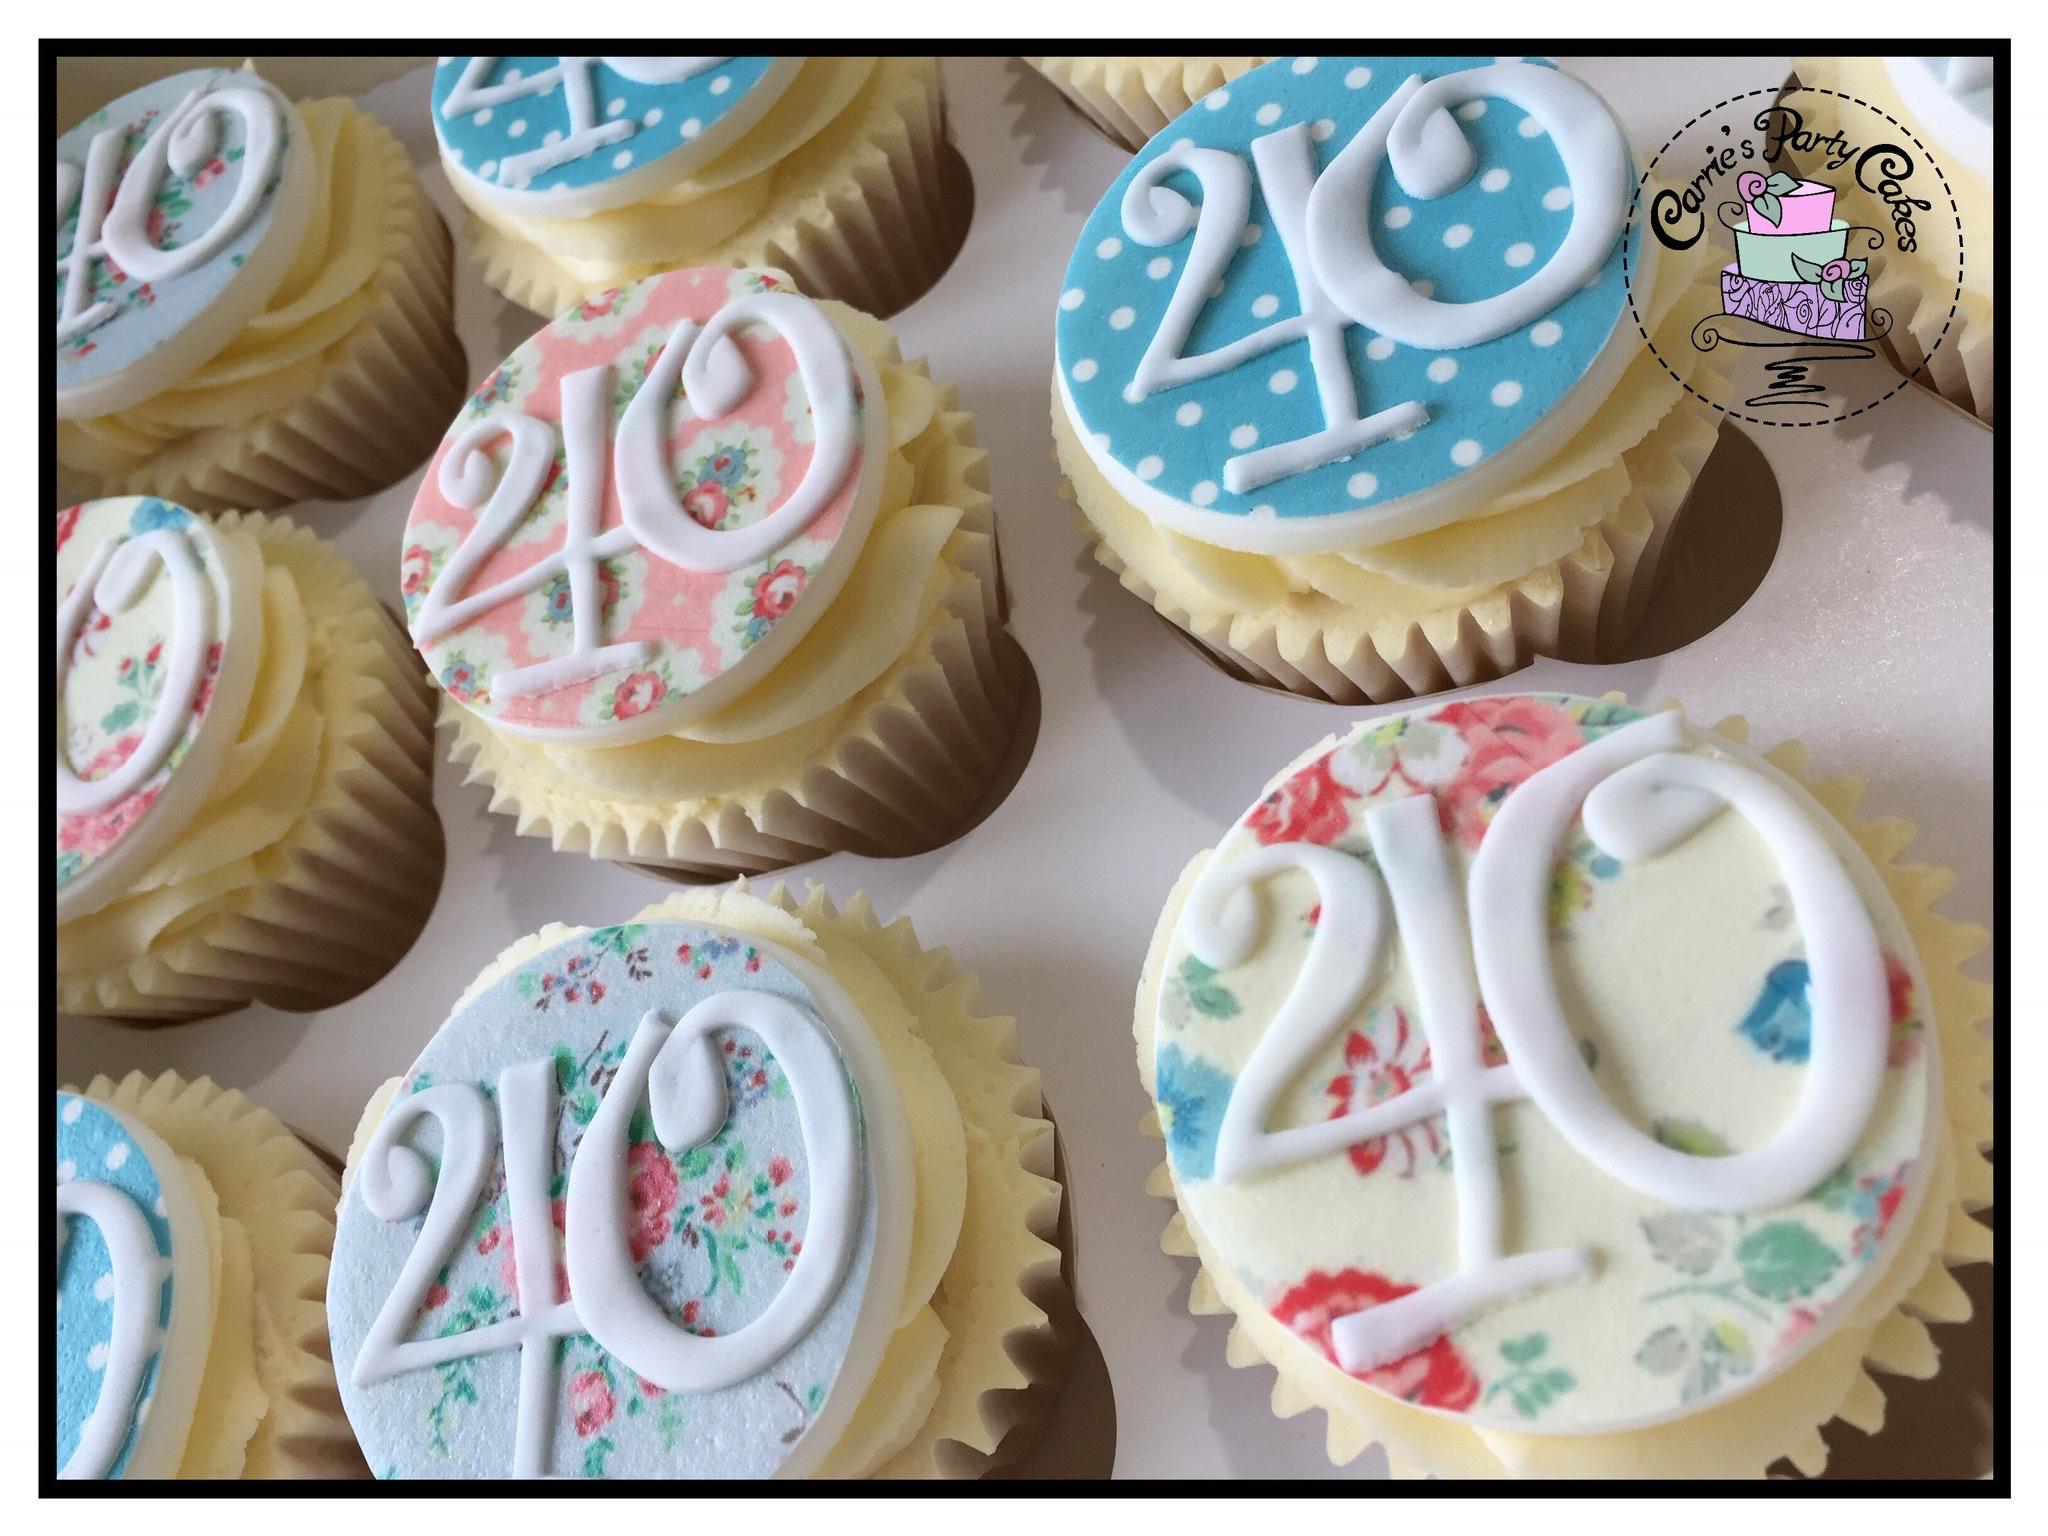 40th cupcakes